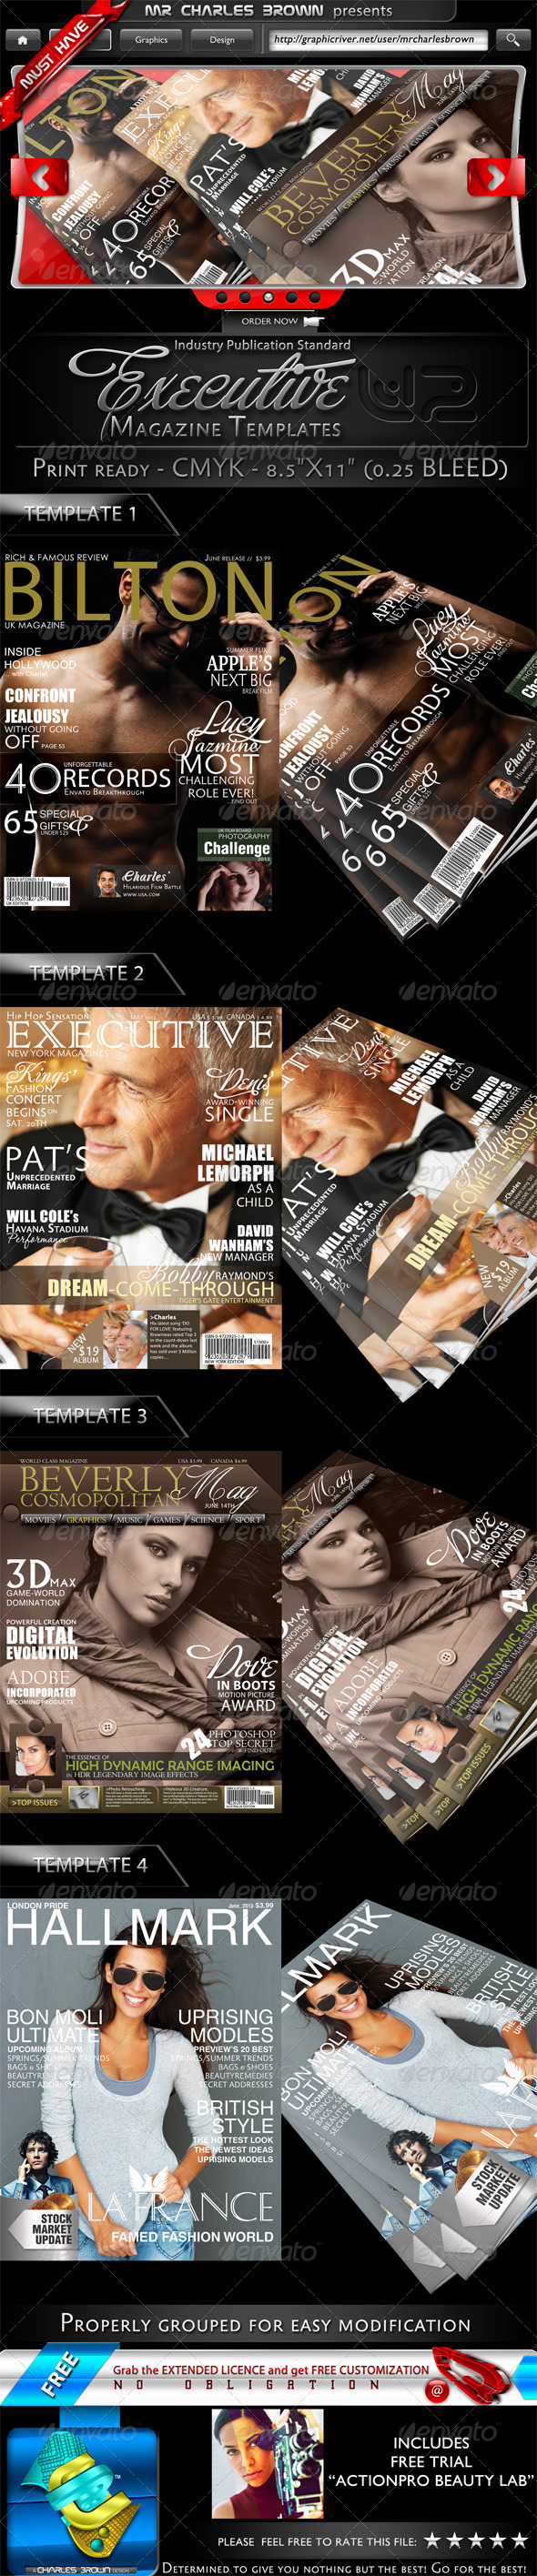 4 Executive Magazine Templates V2 - Magazines Print Templates